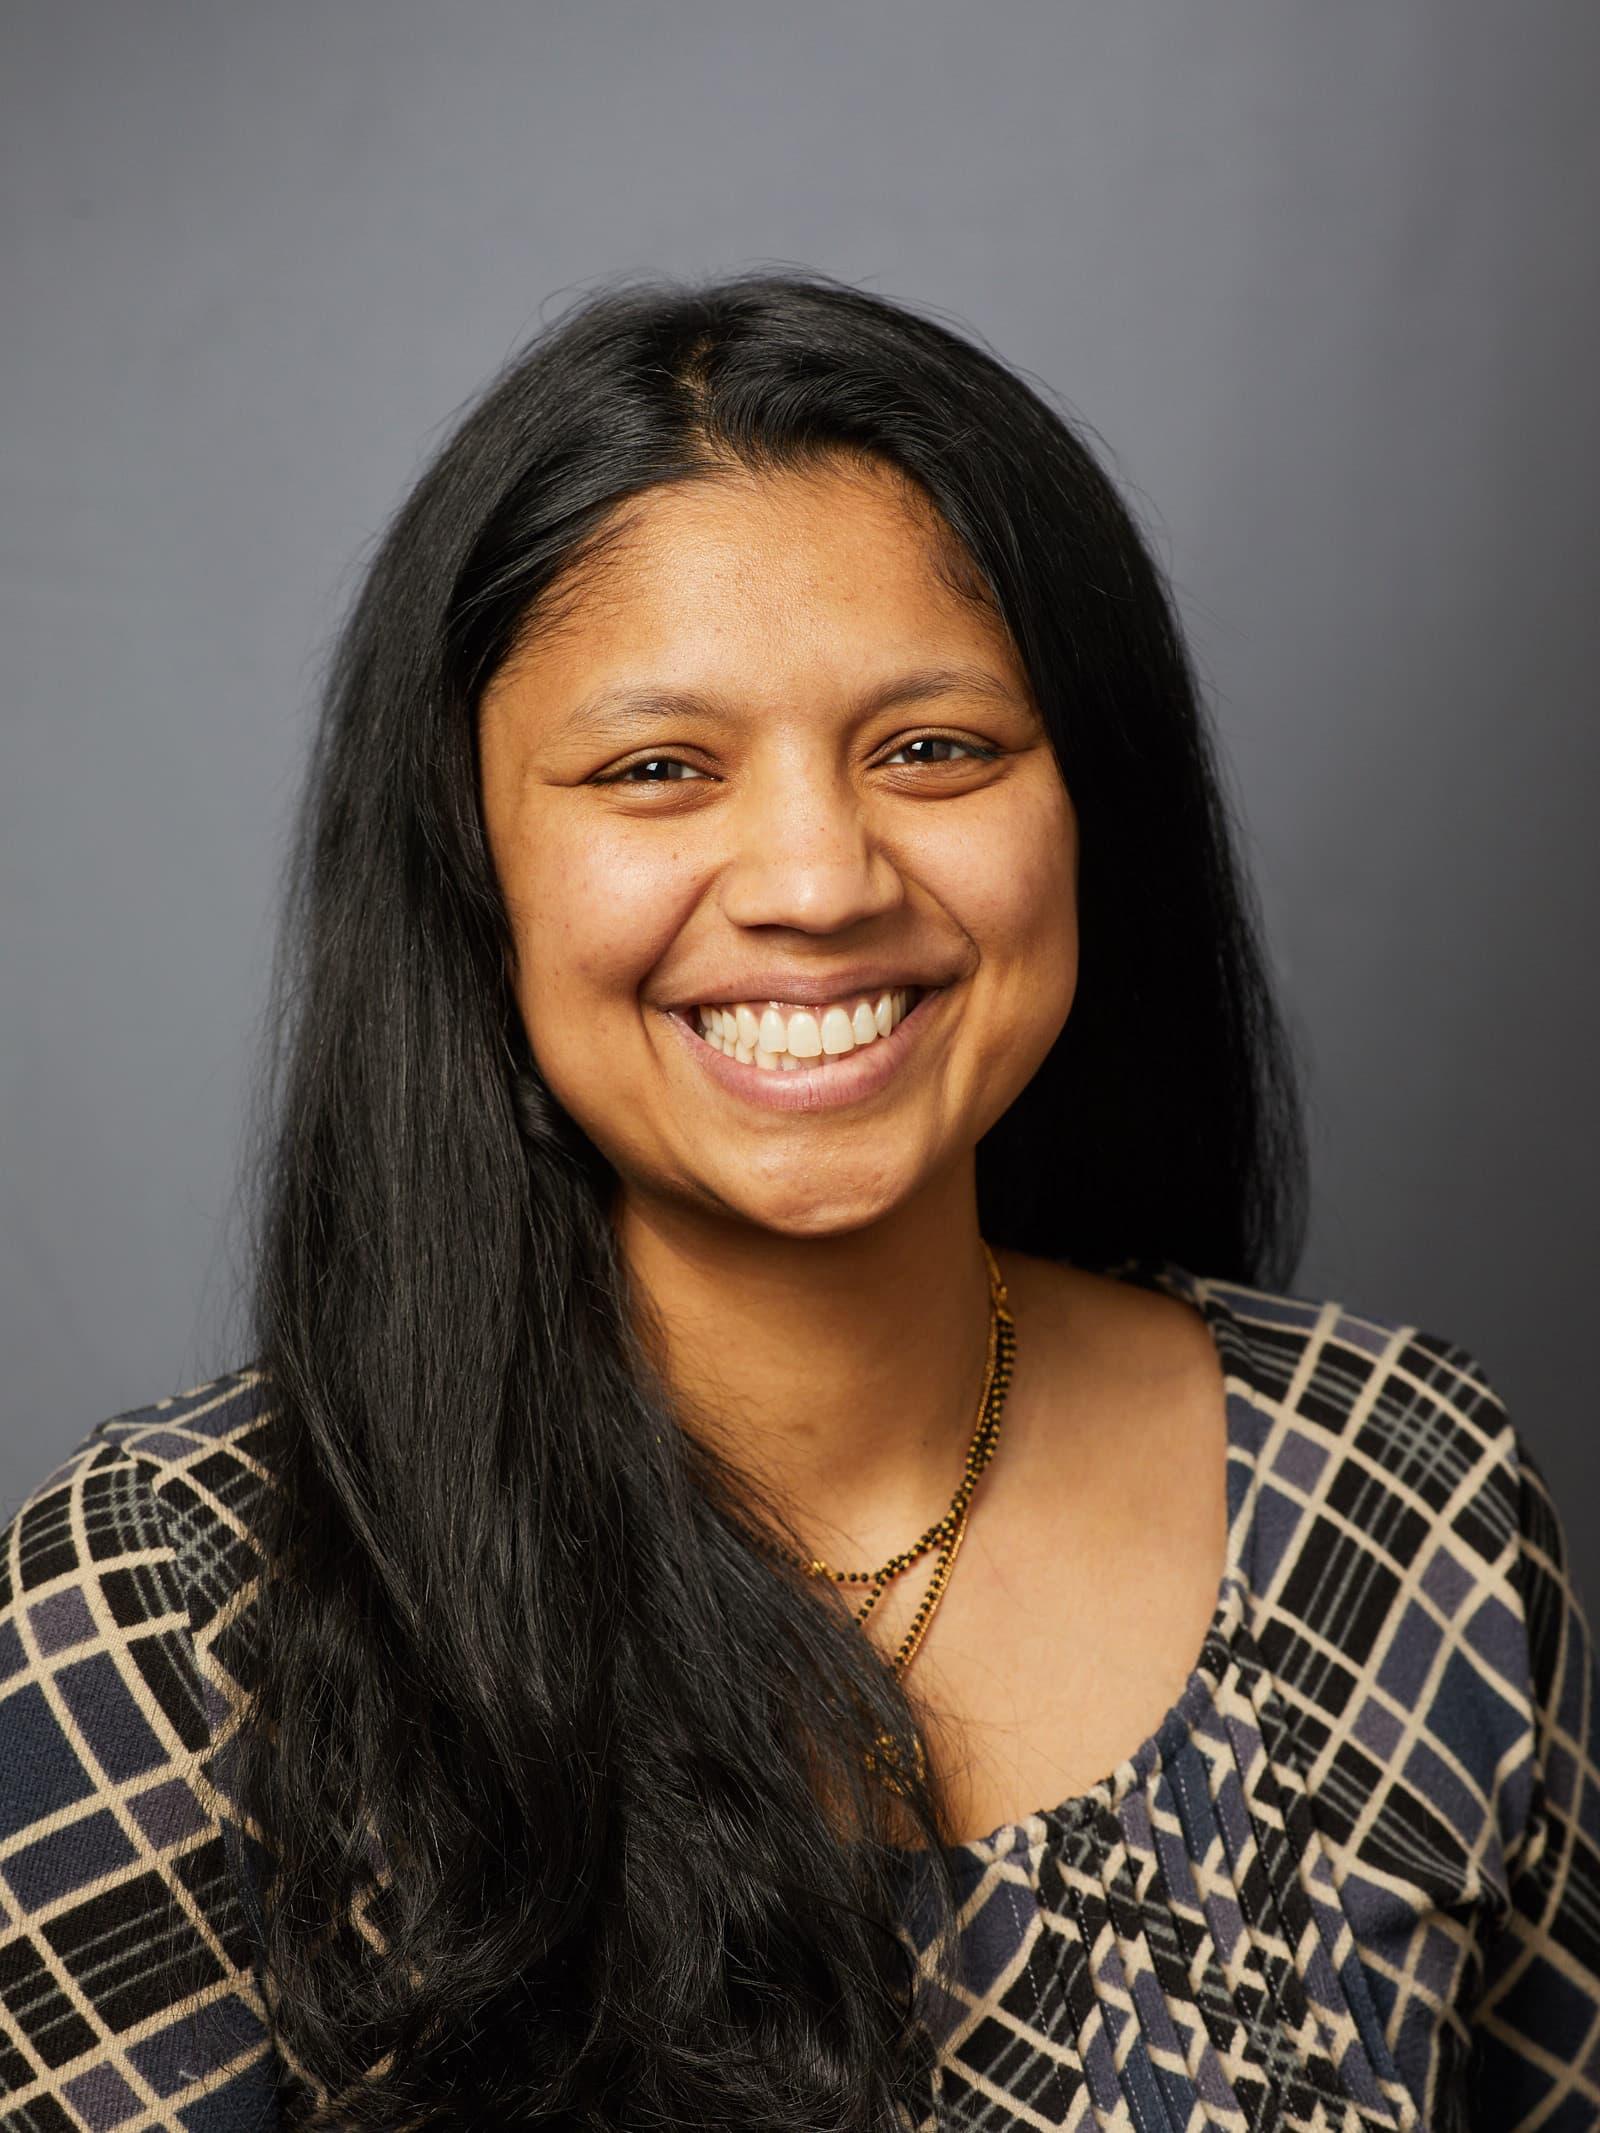 Sarika Ramachandran